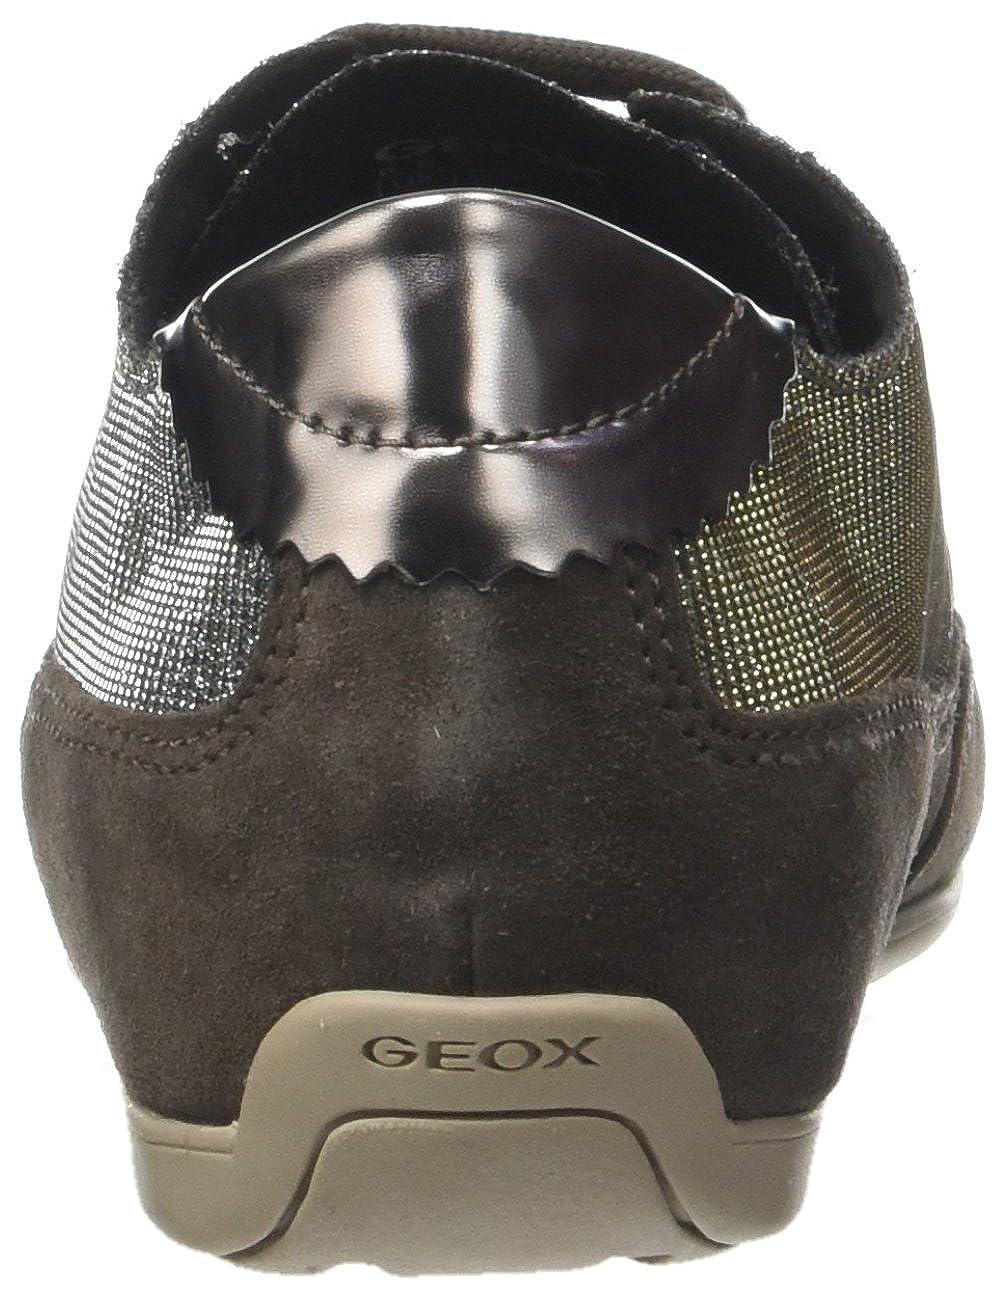 Geox Damen D New Moena Moena Moena D Sneaker  Braun (Gun/Chestnut) 132e29